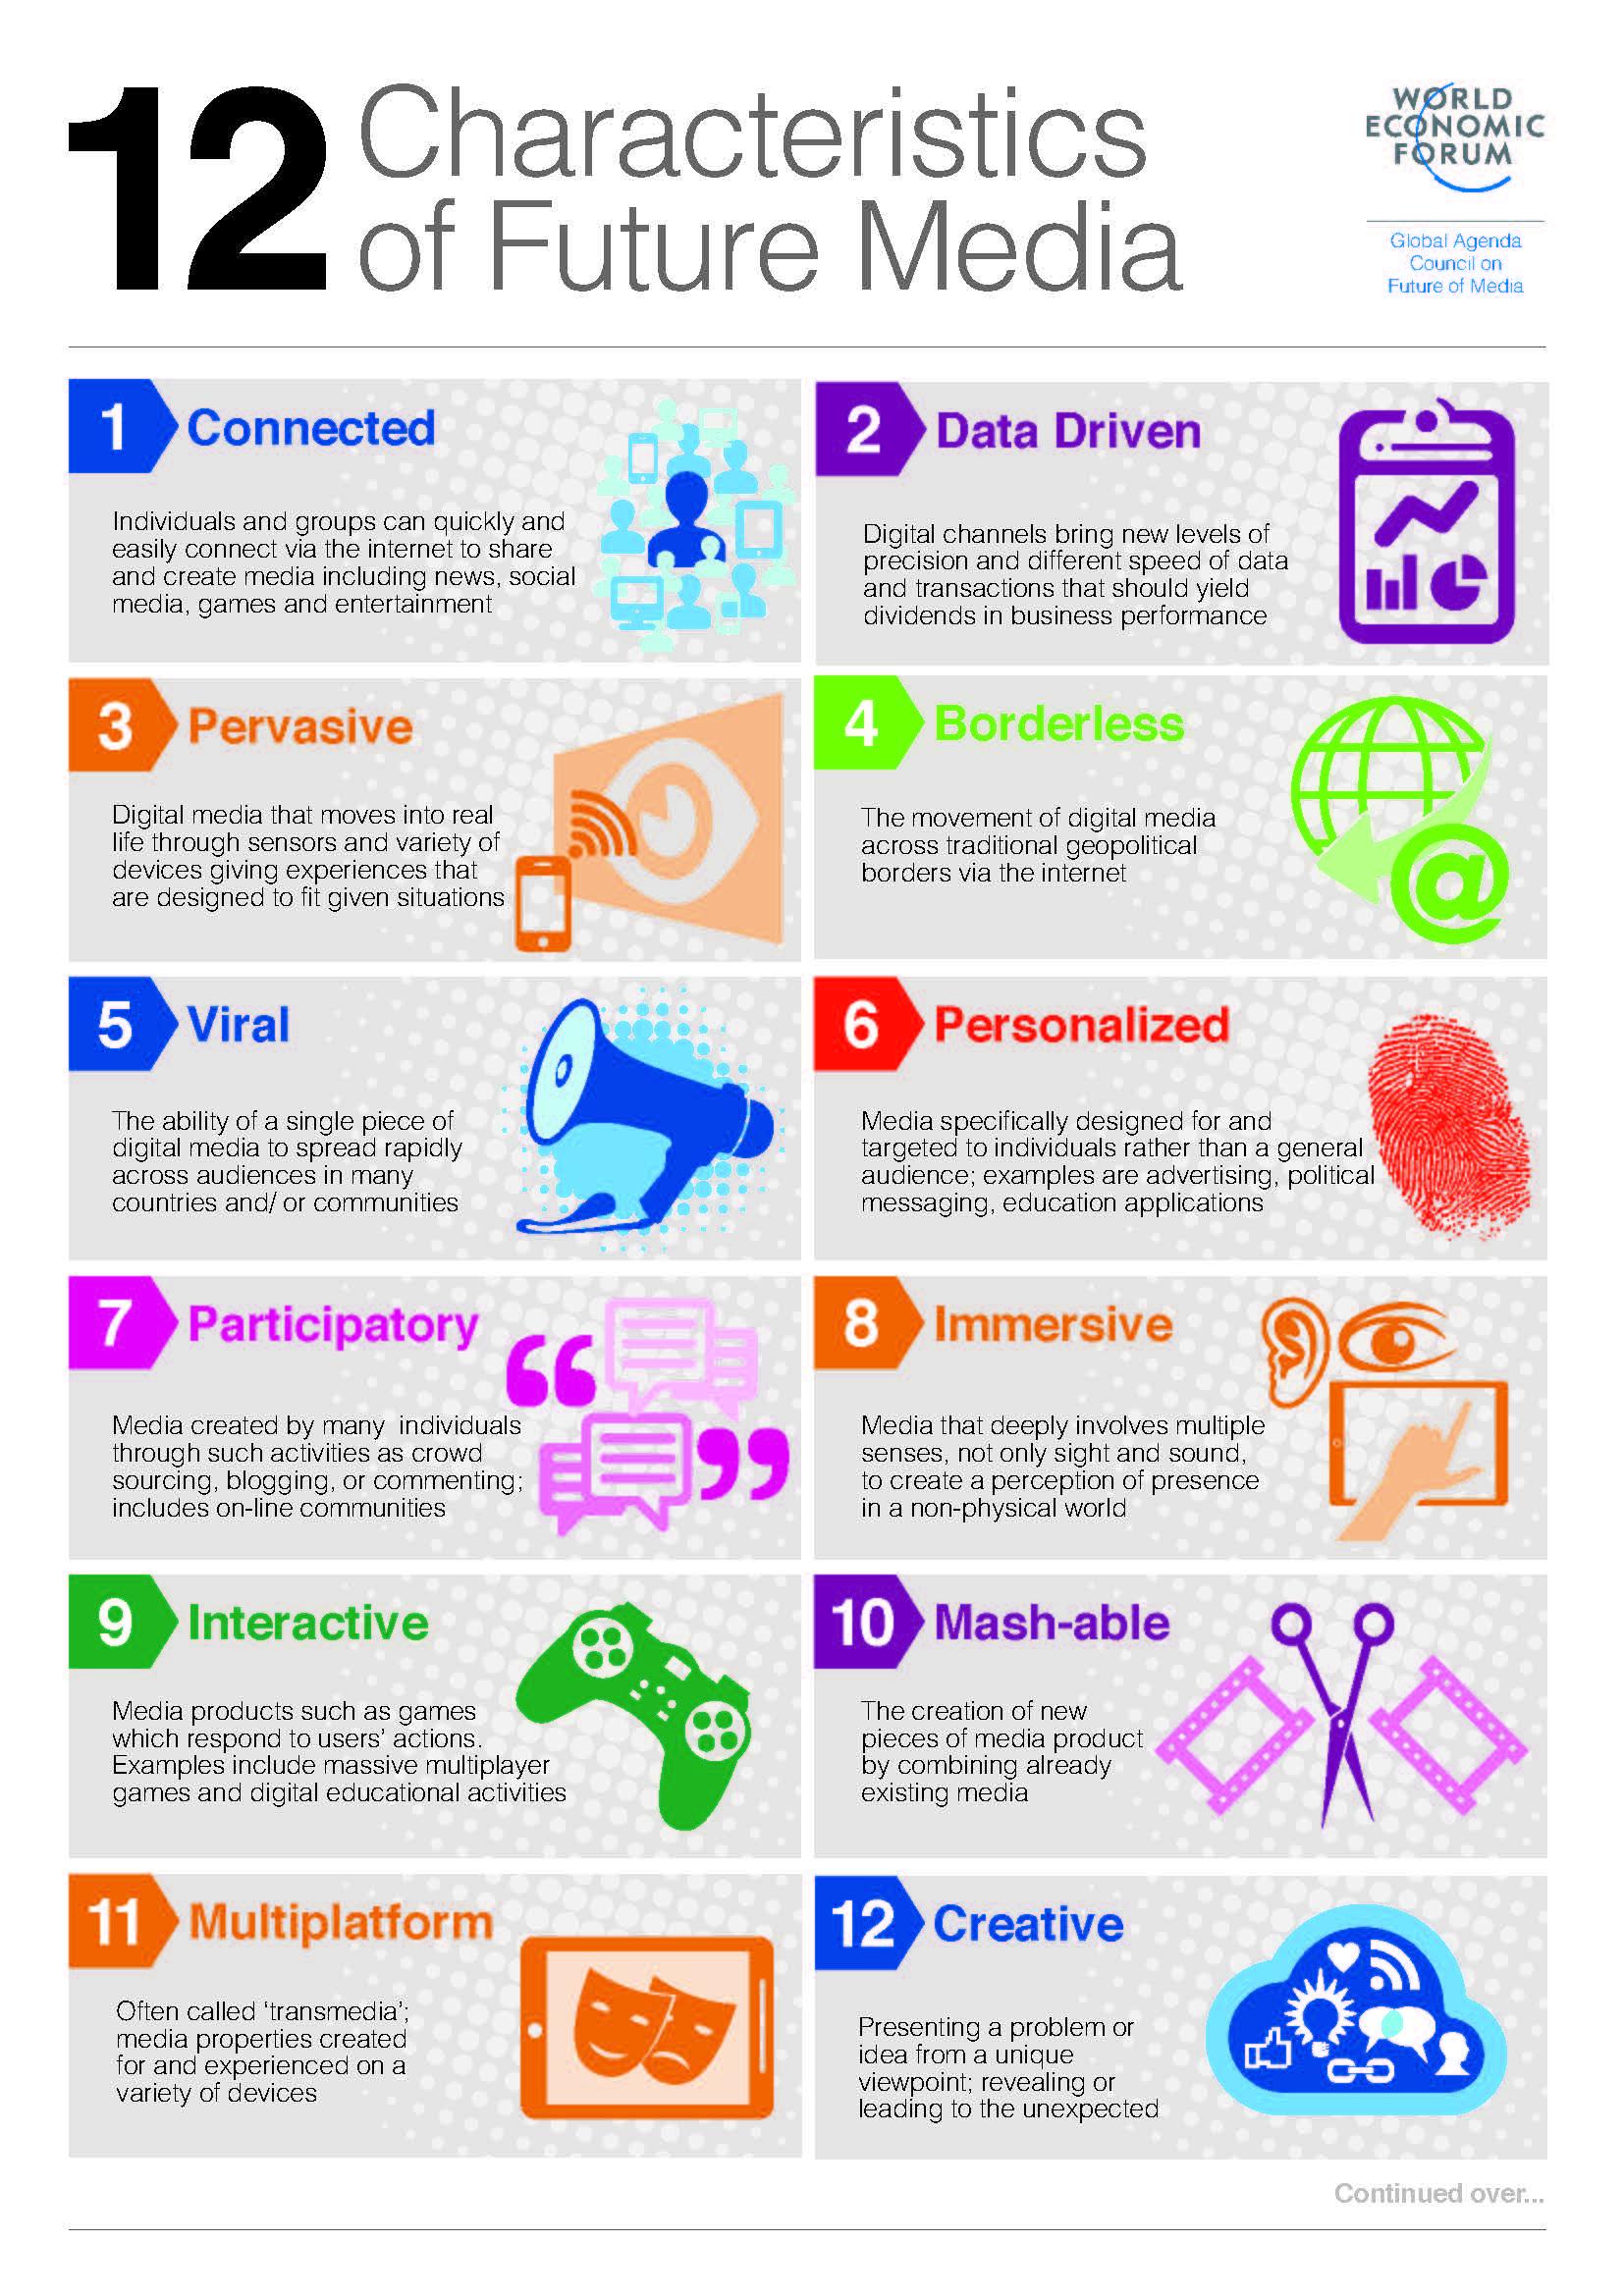 WEF_GAC_FutureMedia_12Characteristics_Infographic_2014